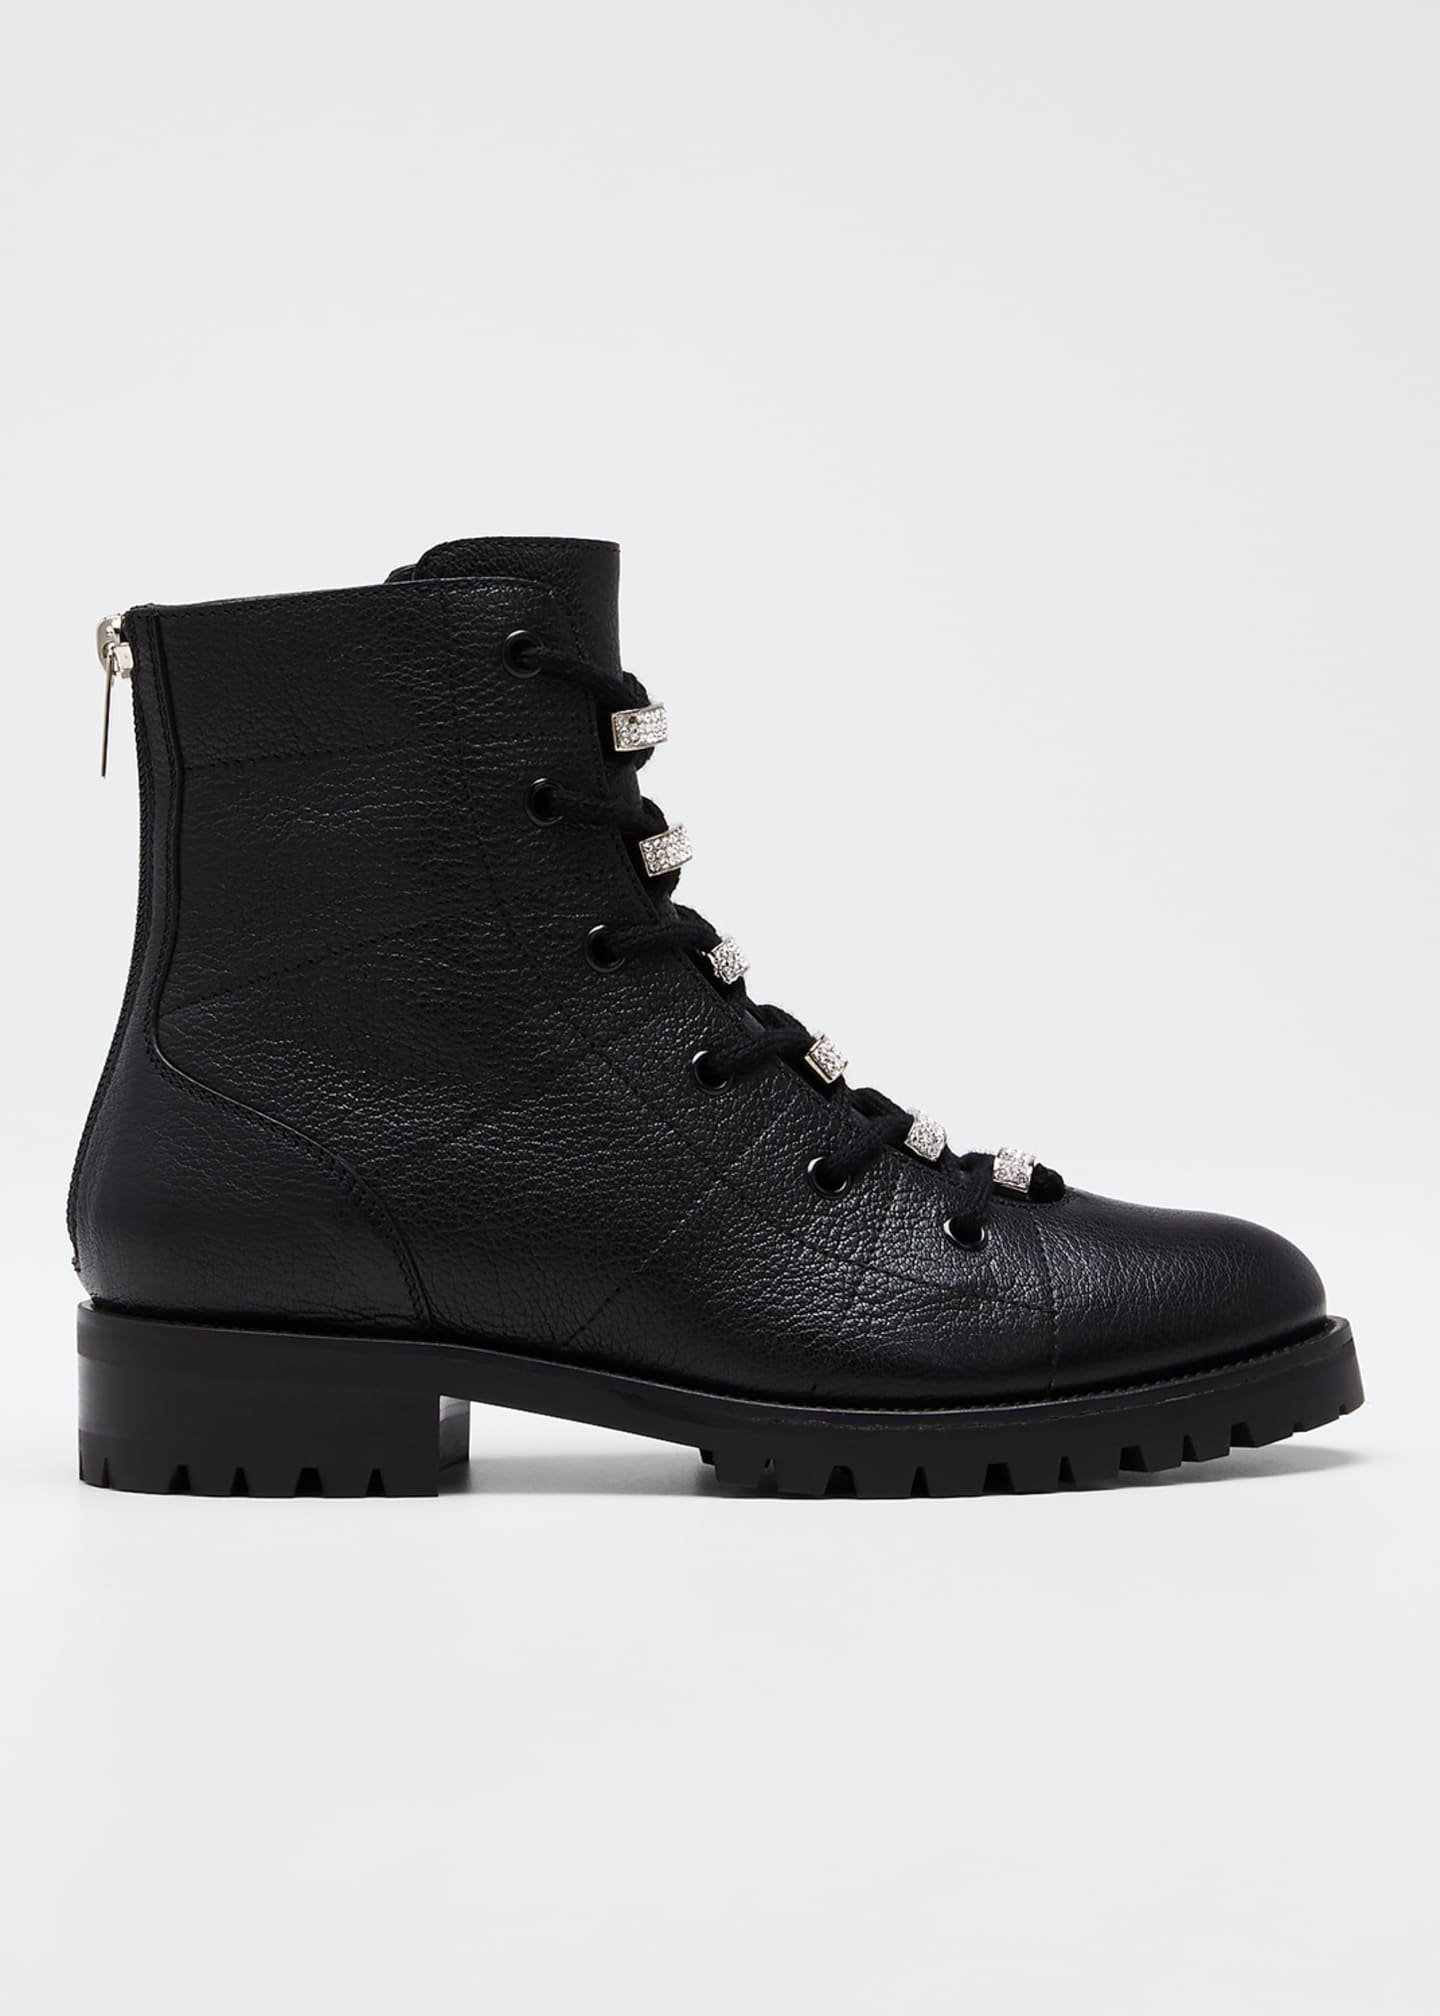 Jimmy Choo Hadley Leather Combat Boots